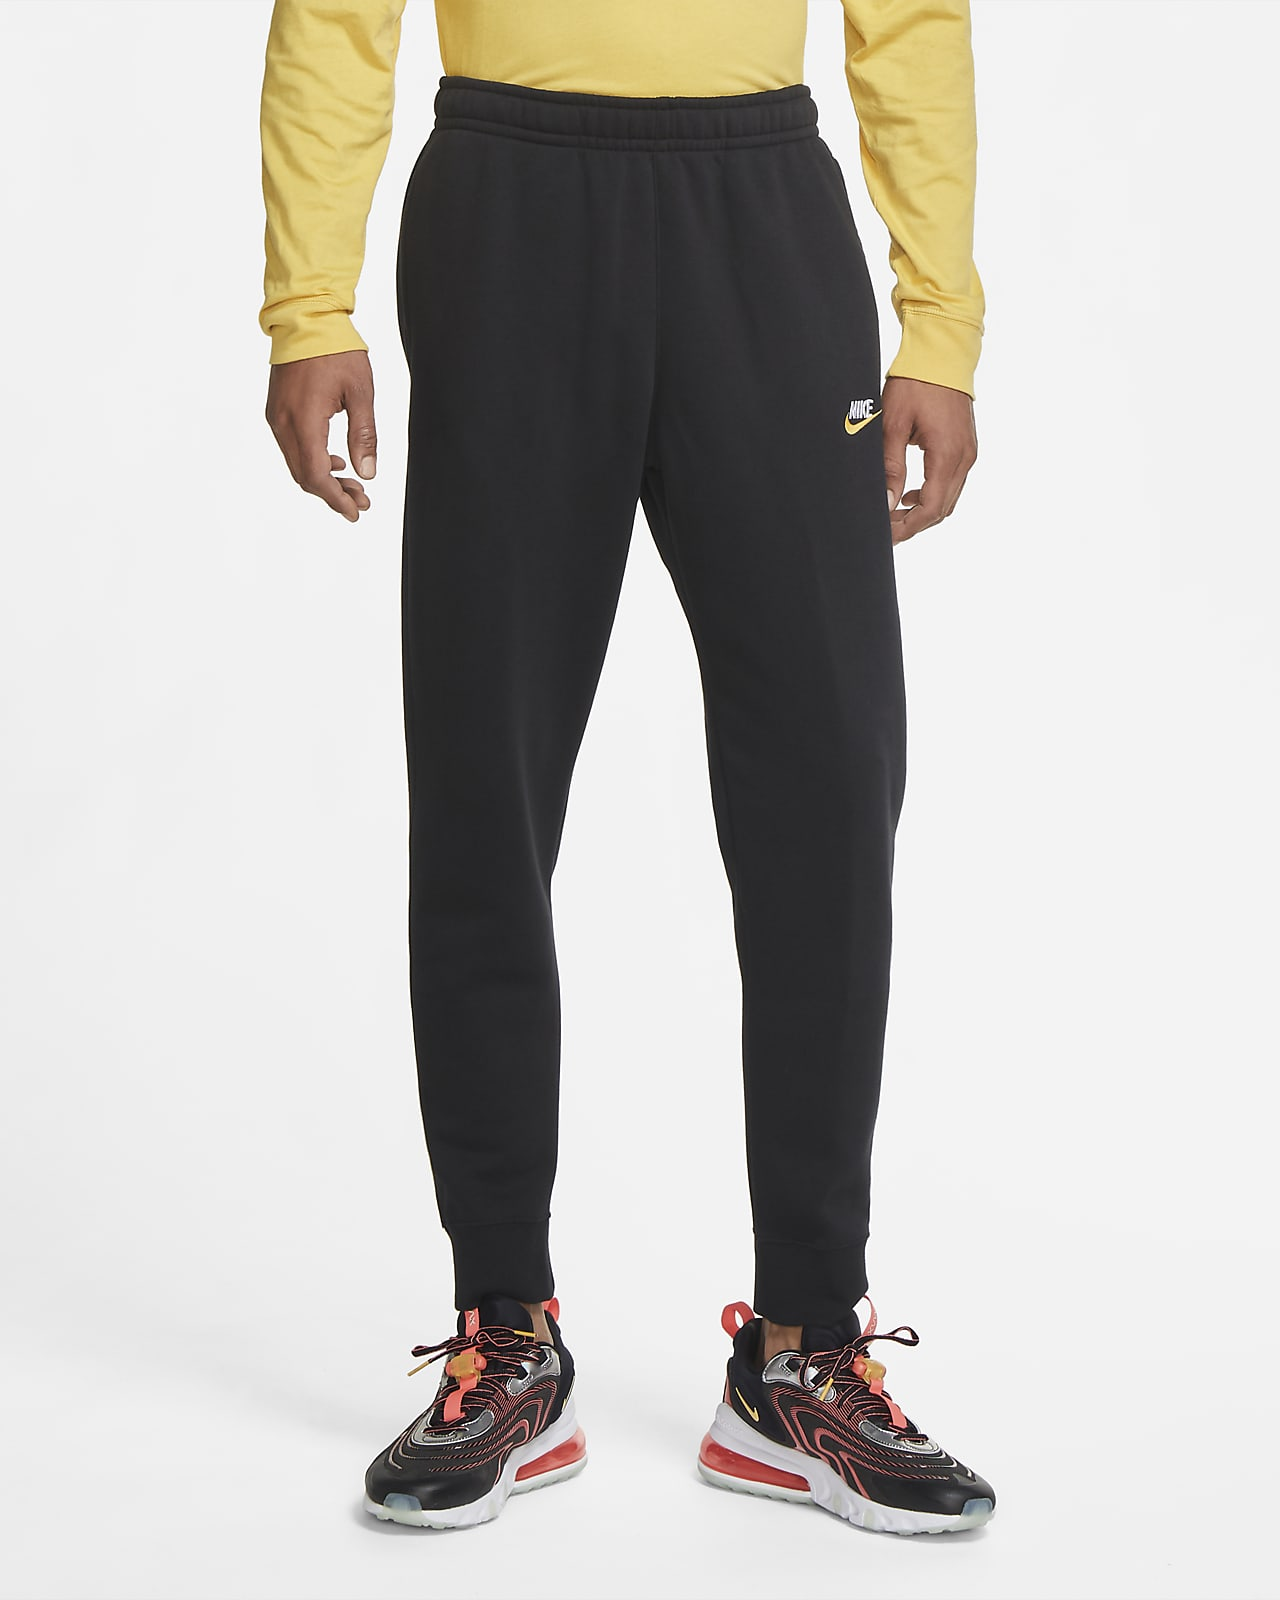 Mayor Vandalir ayudante  Pantalon de jogging Nike Sportswear Club Fleece. Nike CA